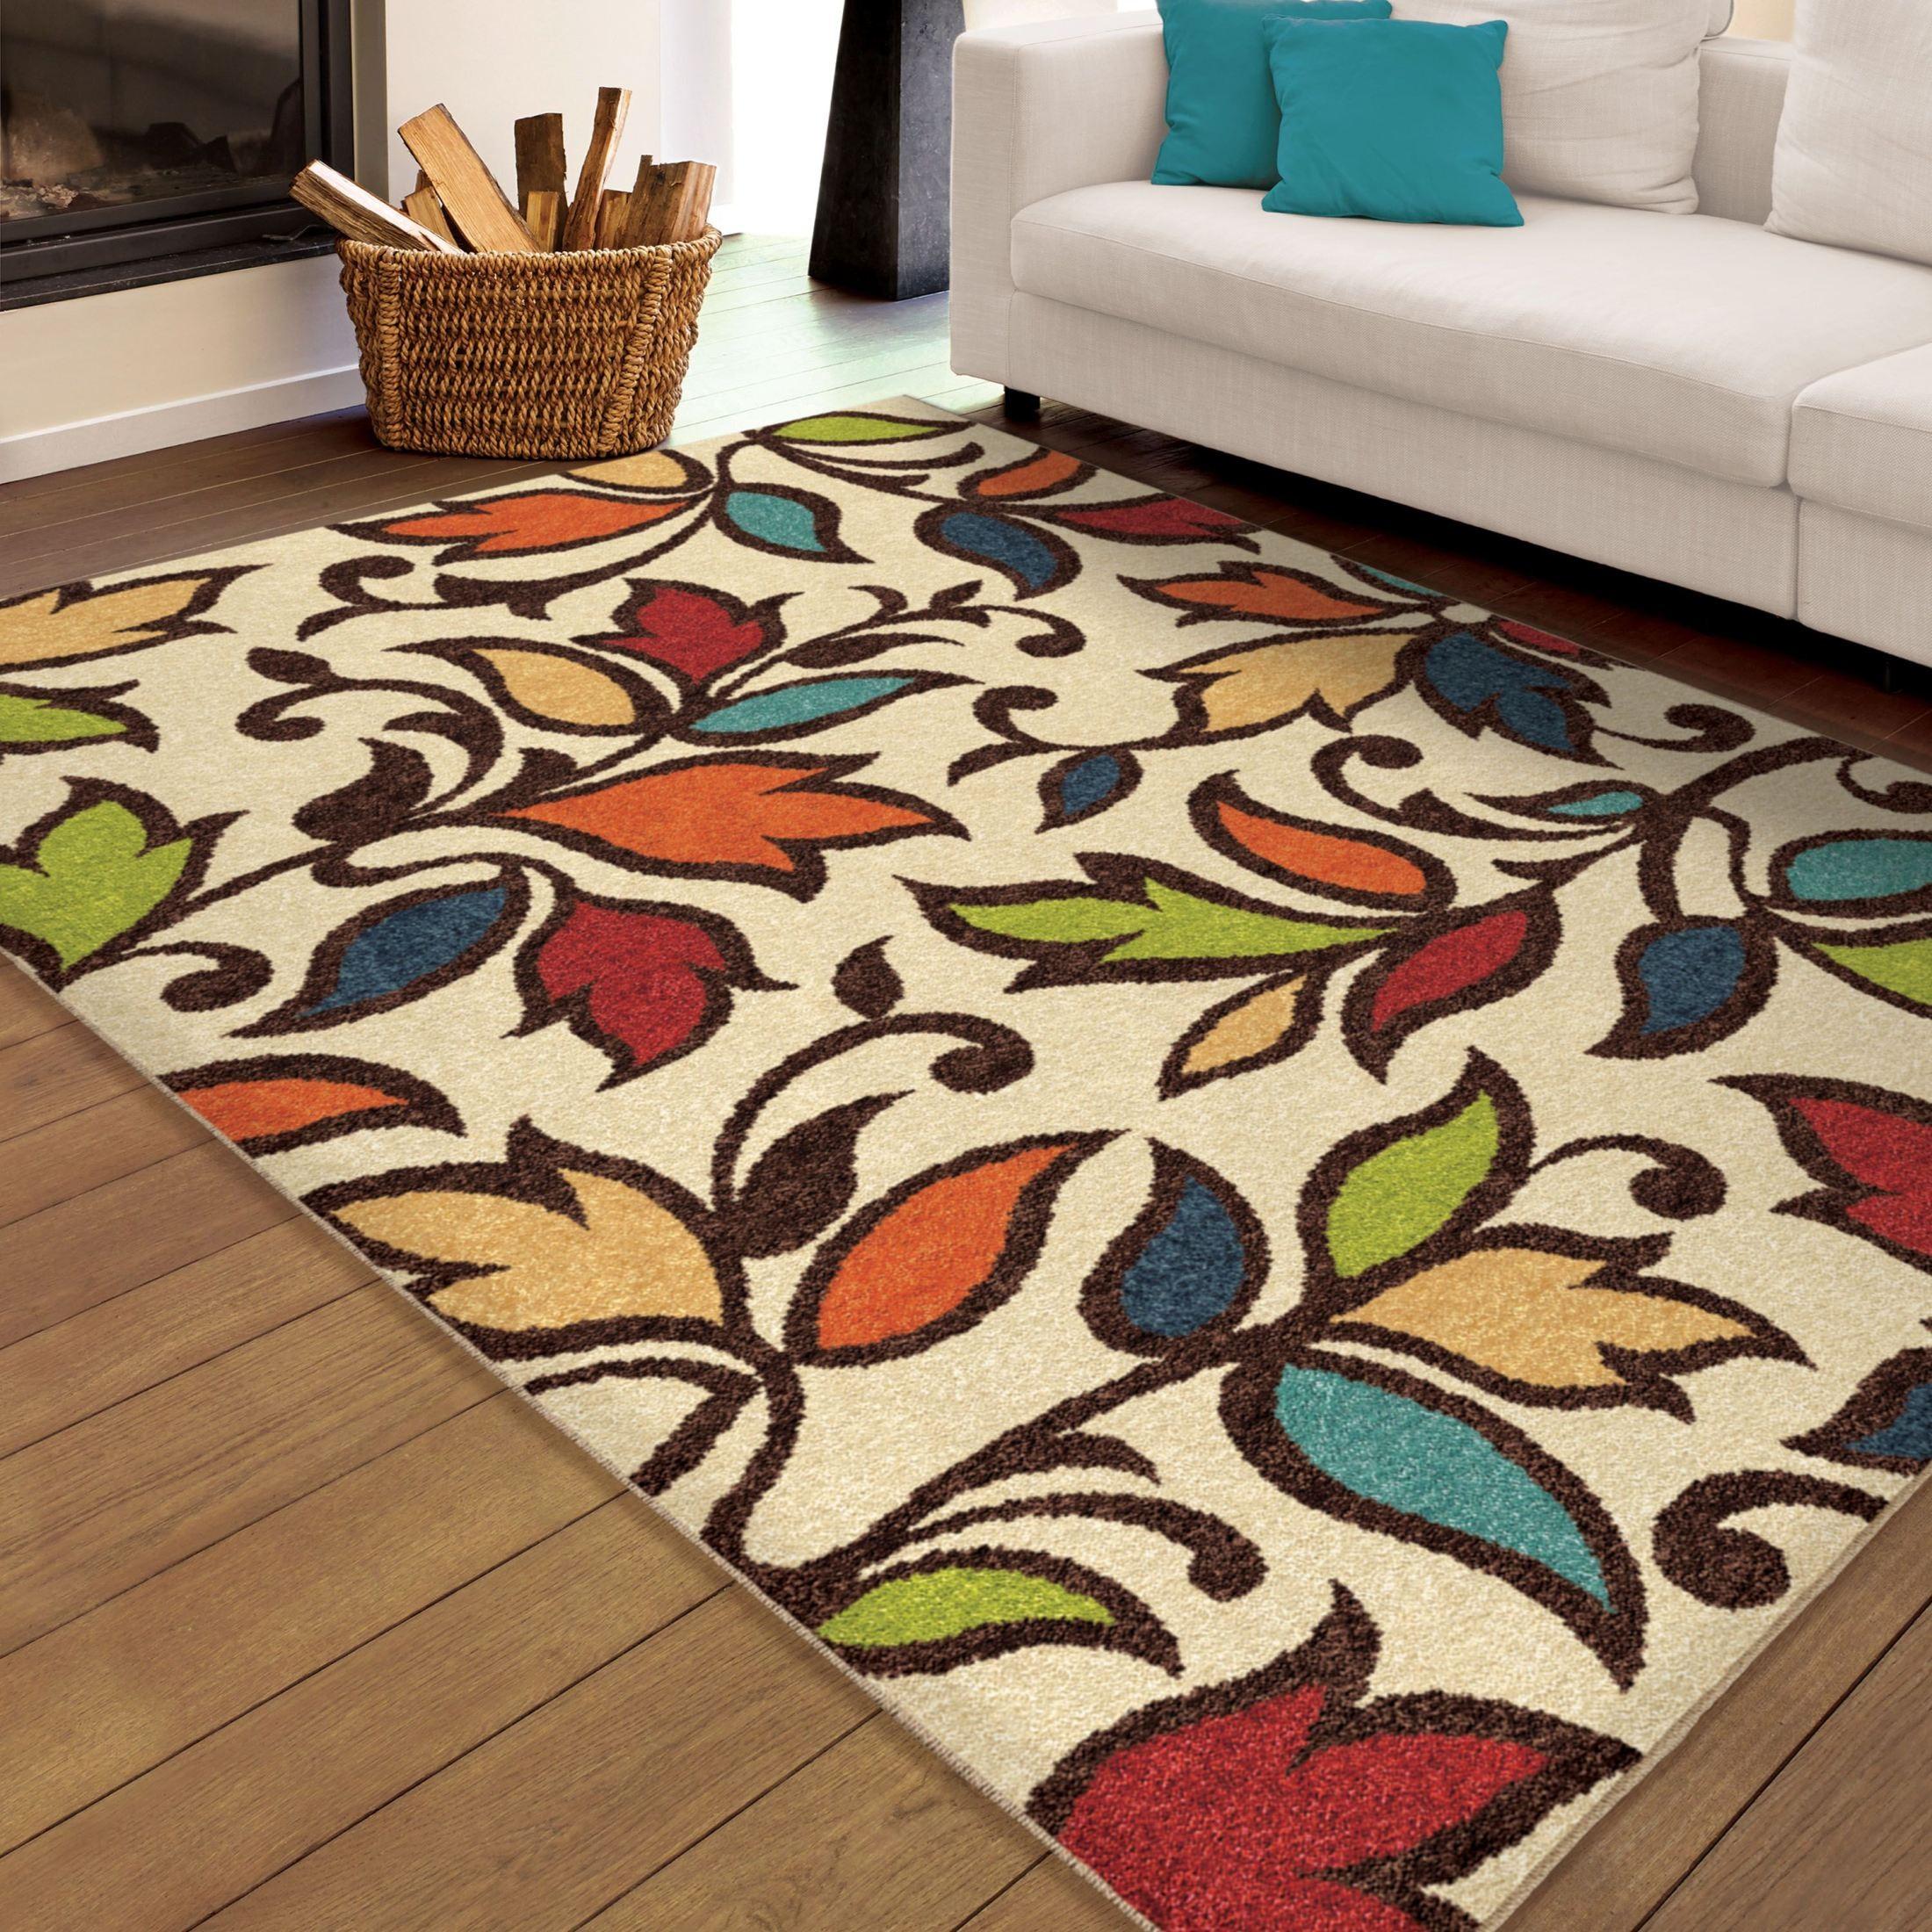 Star Rug Santa Barbara: Veranda Indoor/Outdoor Leaves Despeinada Ivory Large Area